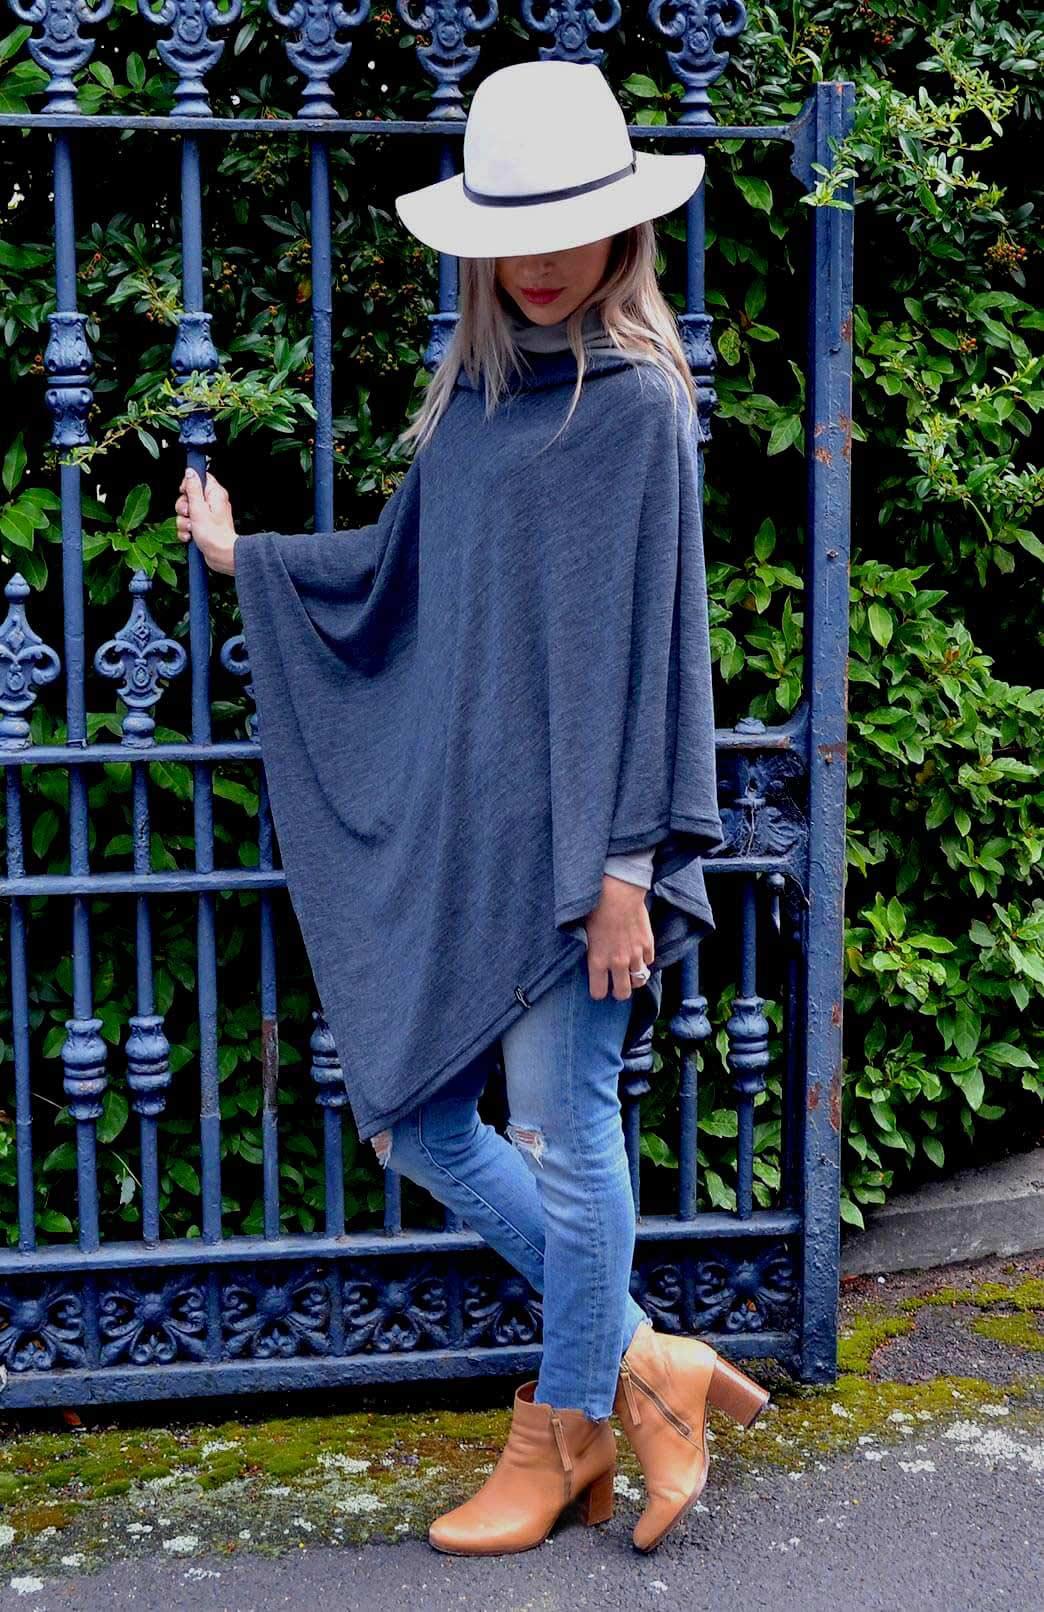 Oversized Poncho - Plain - Women's Charcoal Grey Wool Oversized Poncho - Smitten Merino Tasmania Australia